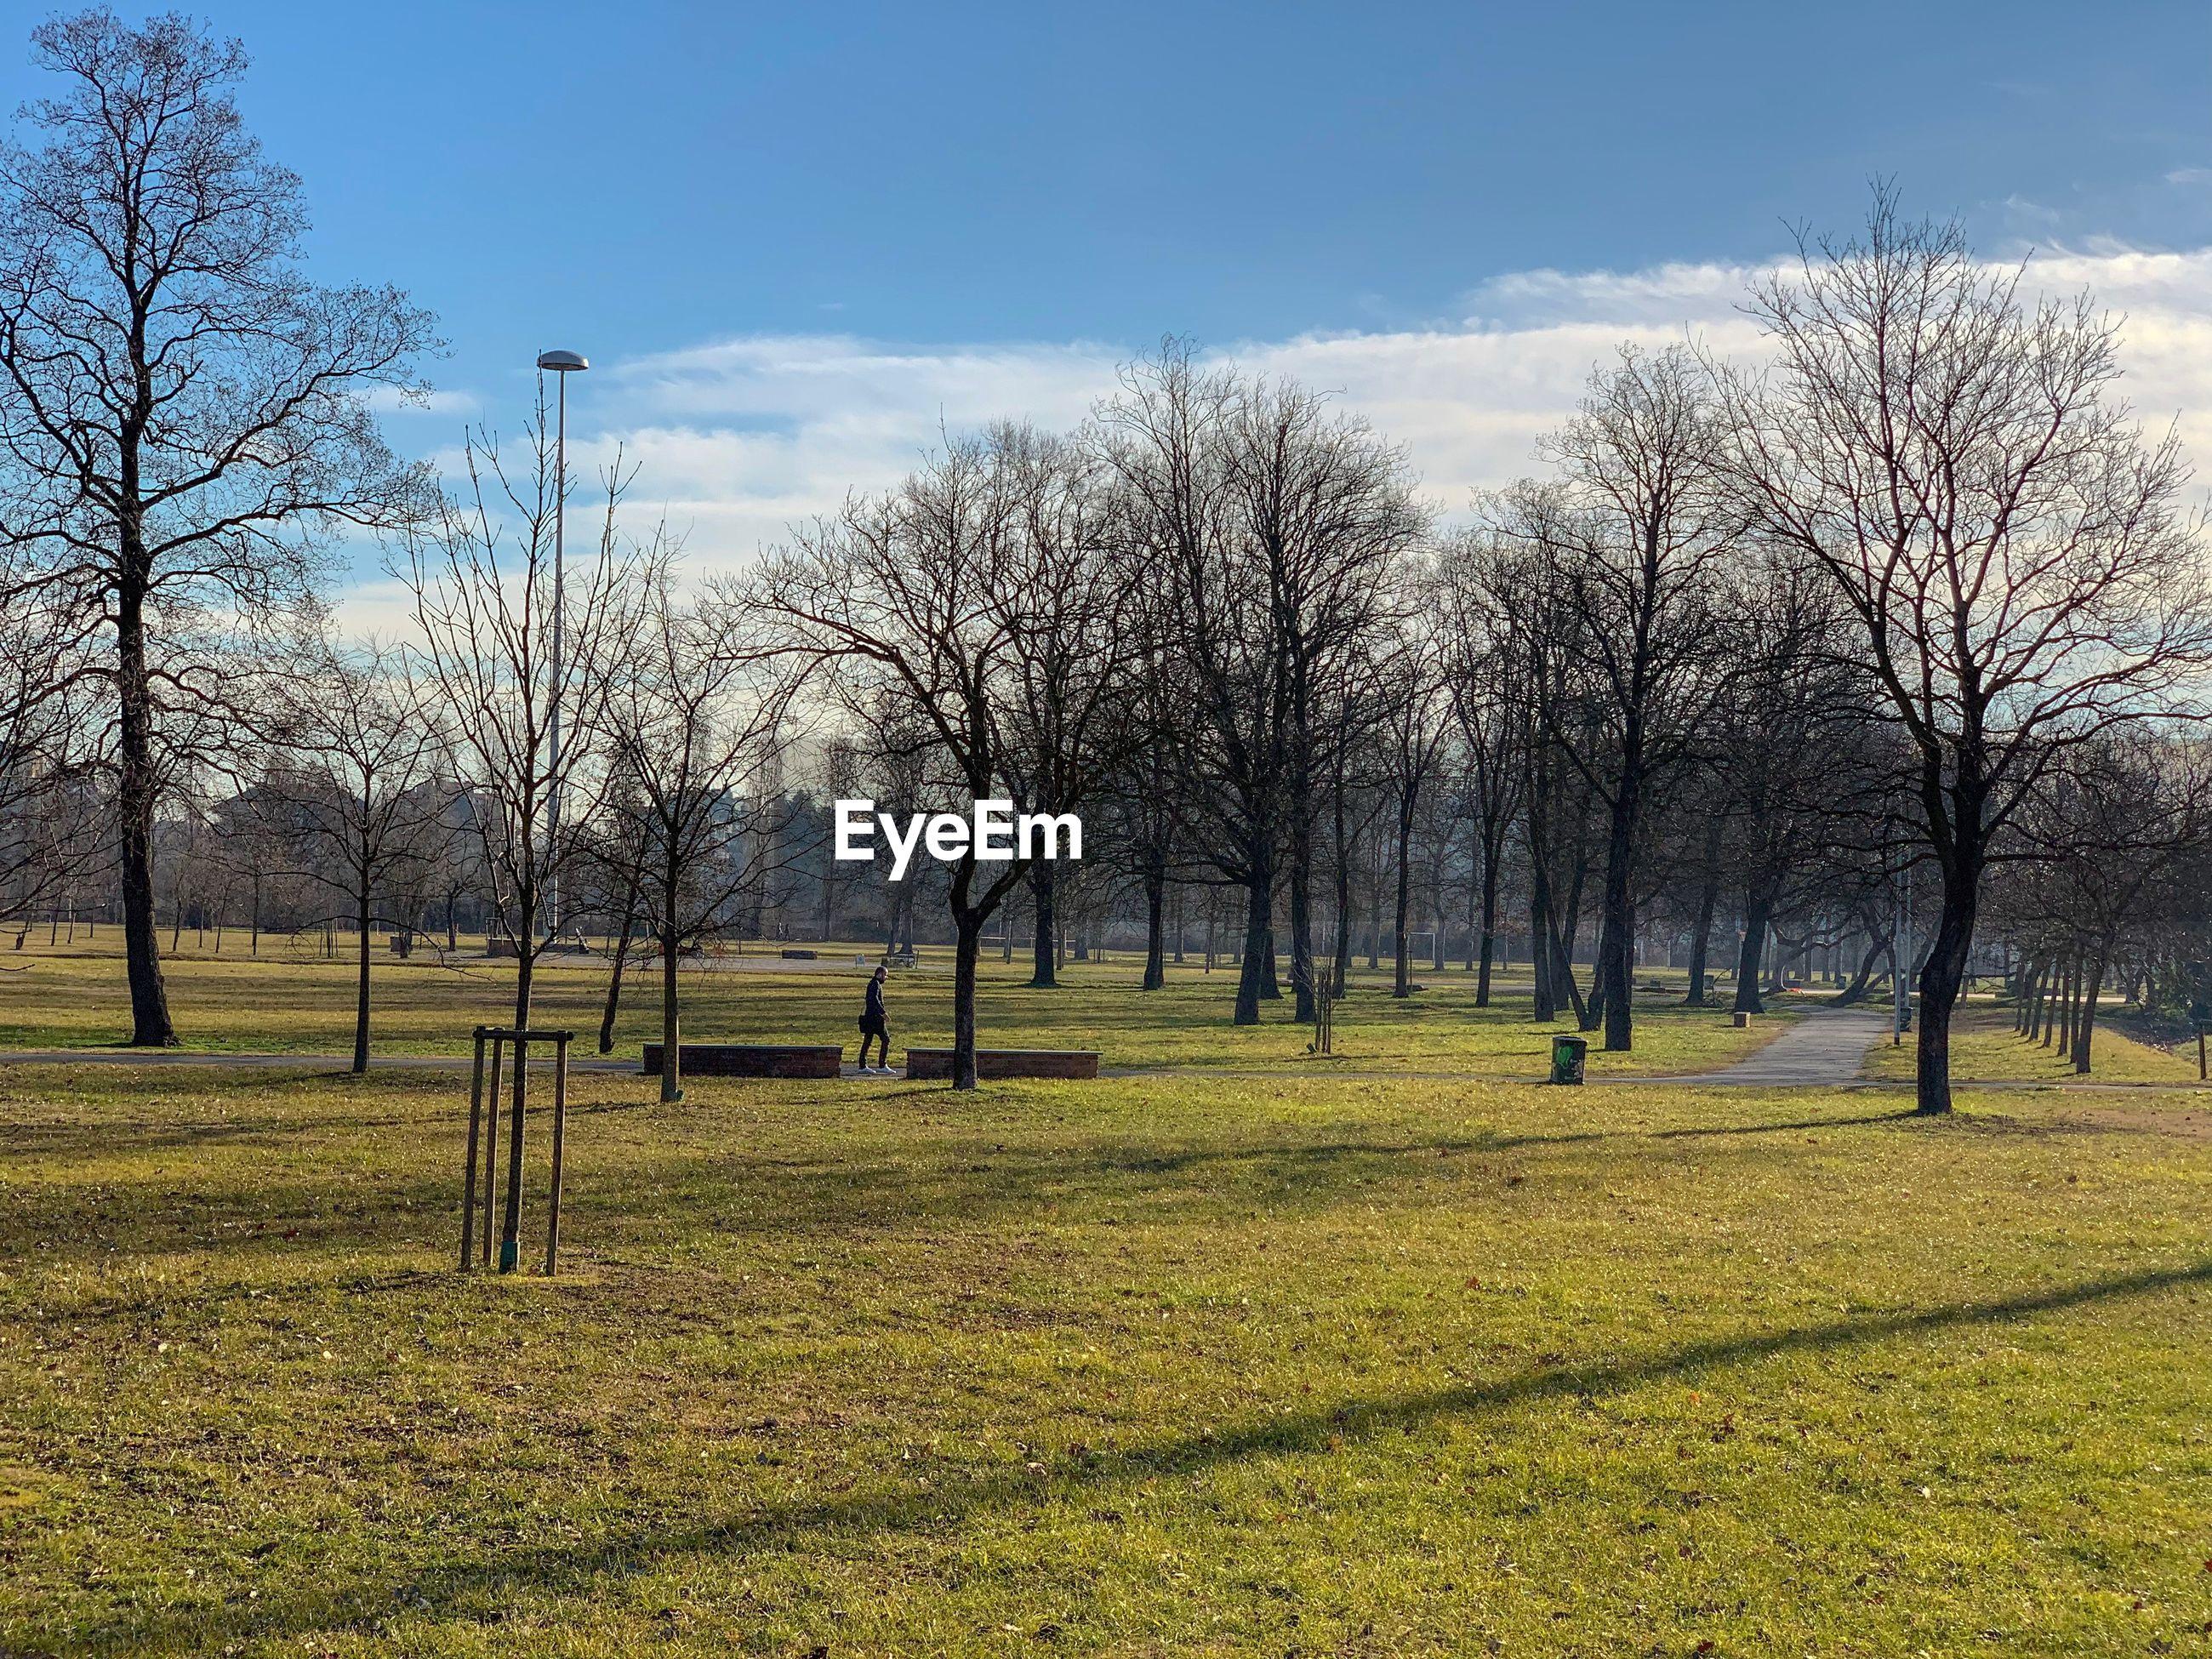 Man walking by bare trees on field against sky